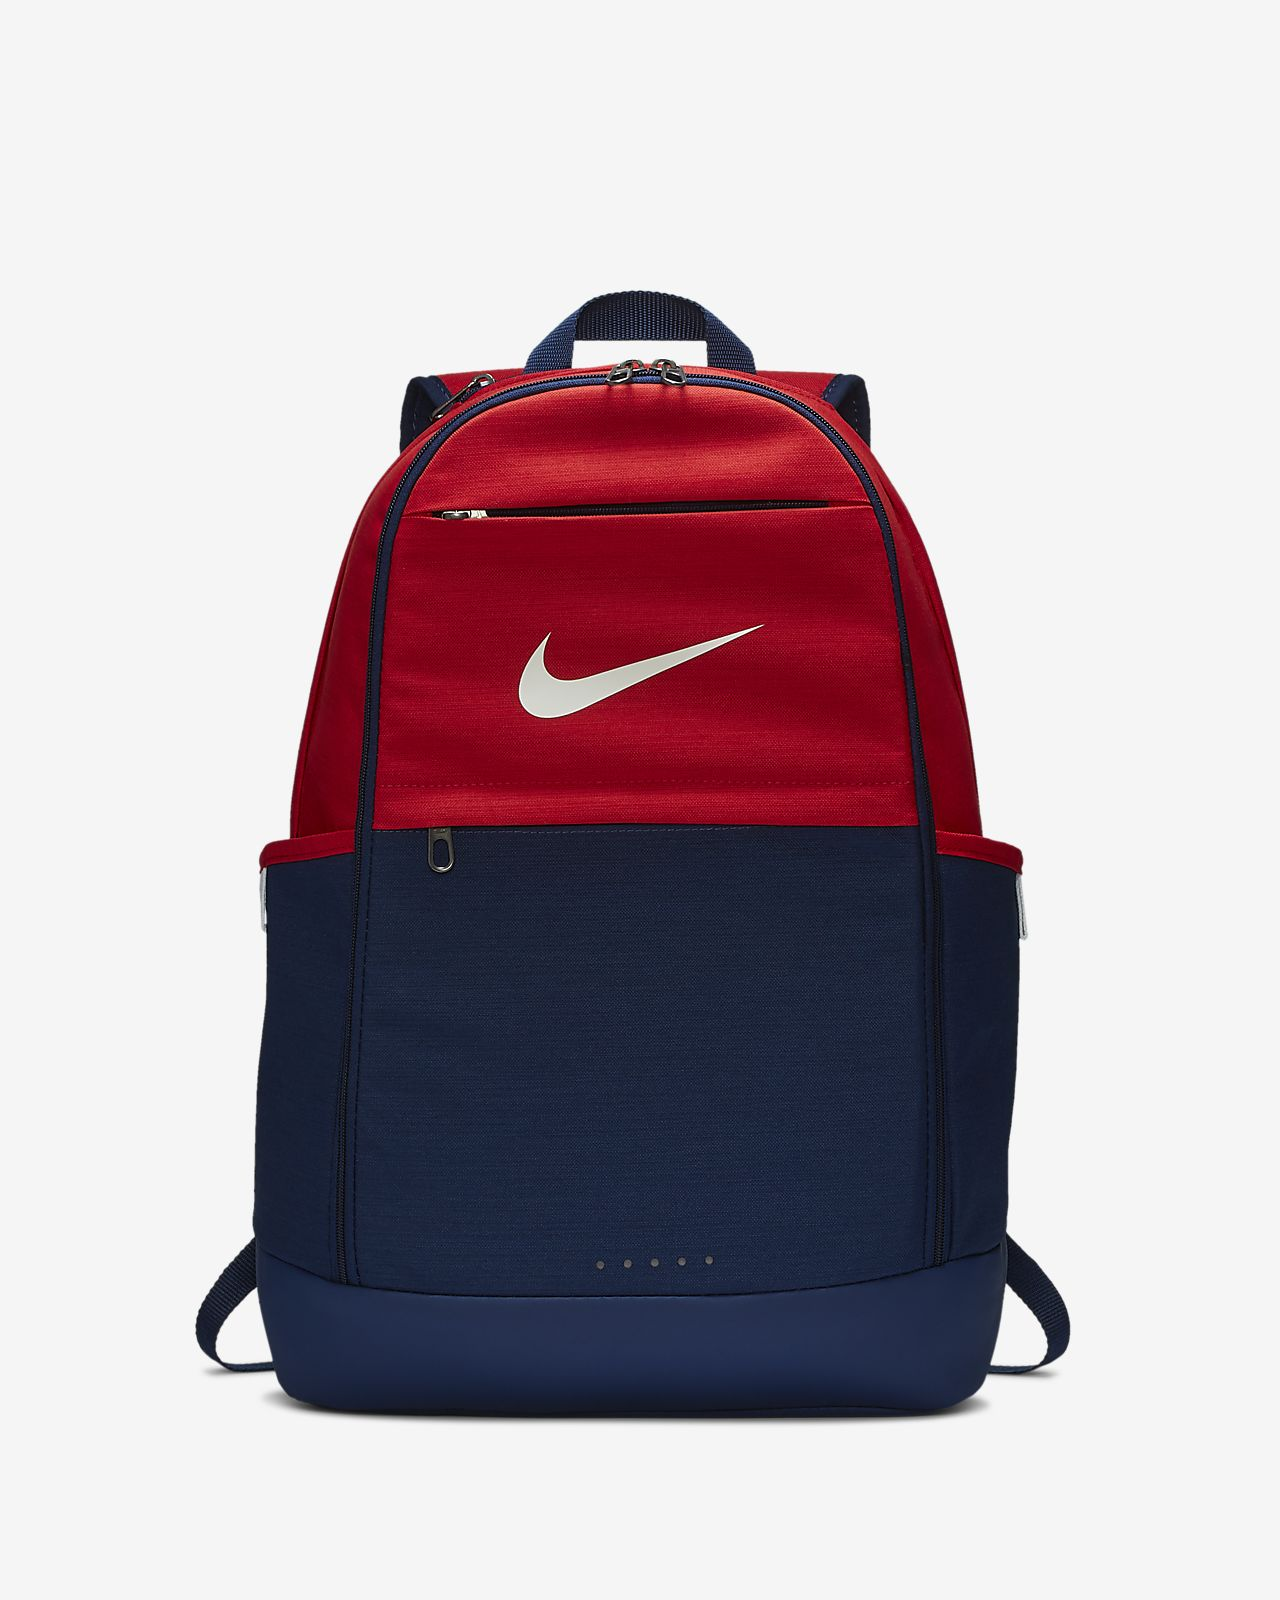 5e14a35bfa4 Nike Brasilia. $50. Low Resolution Nike Brasilia Training Backpack ...